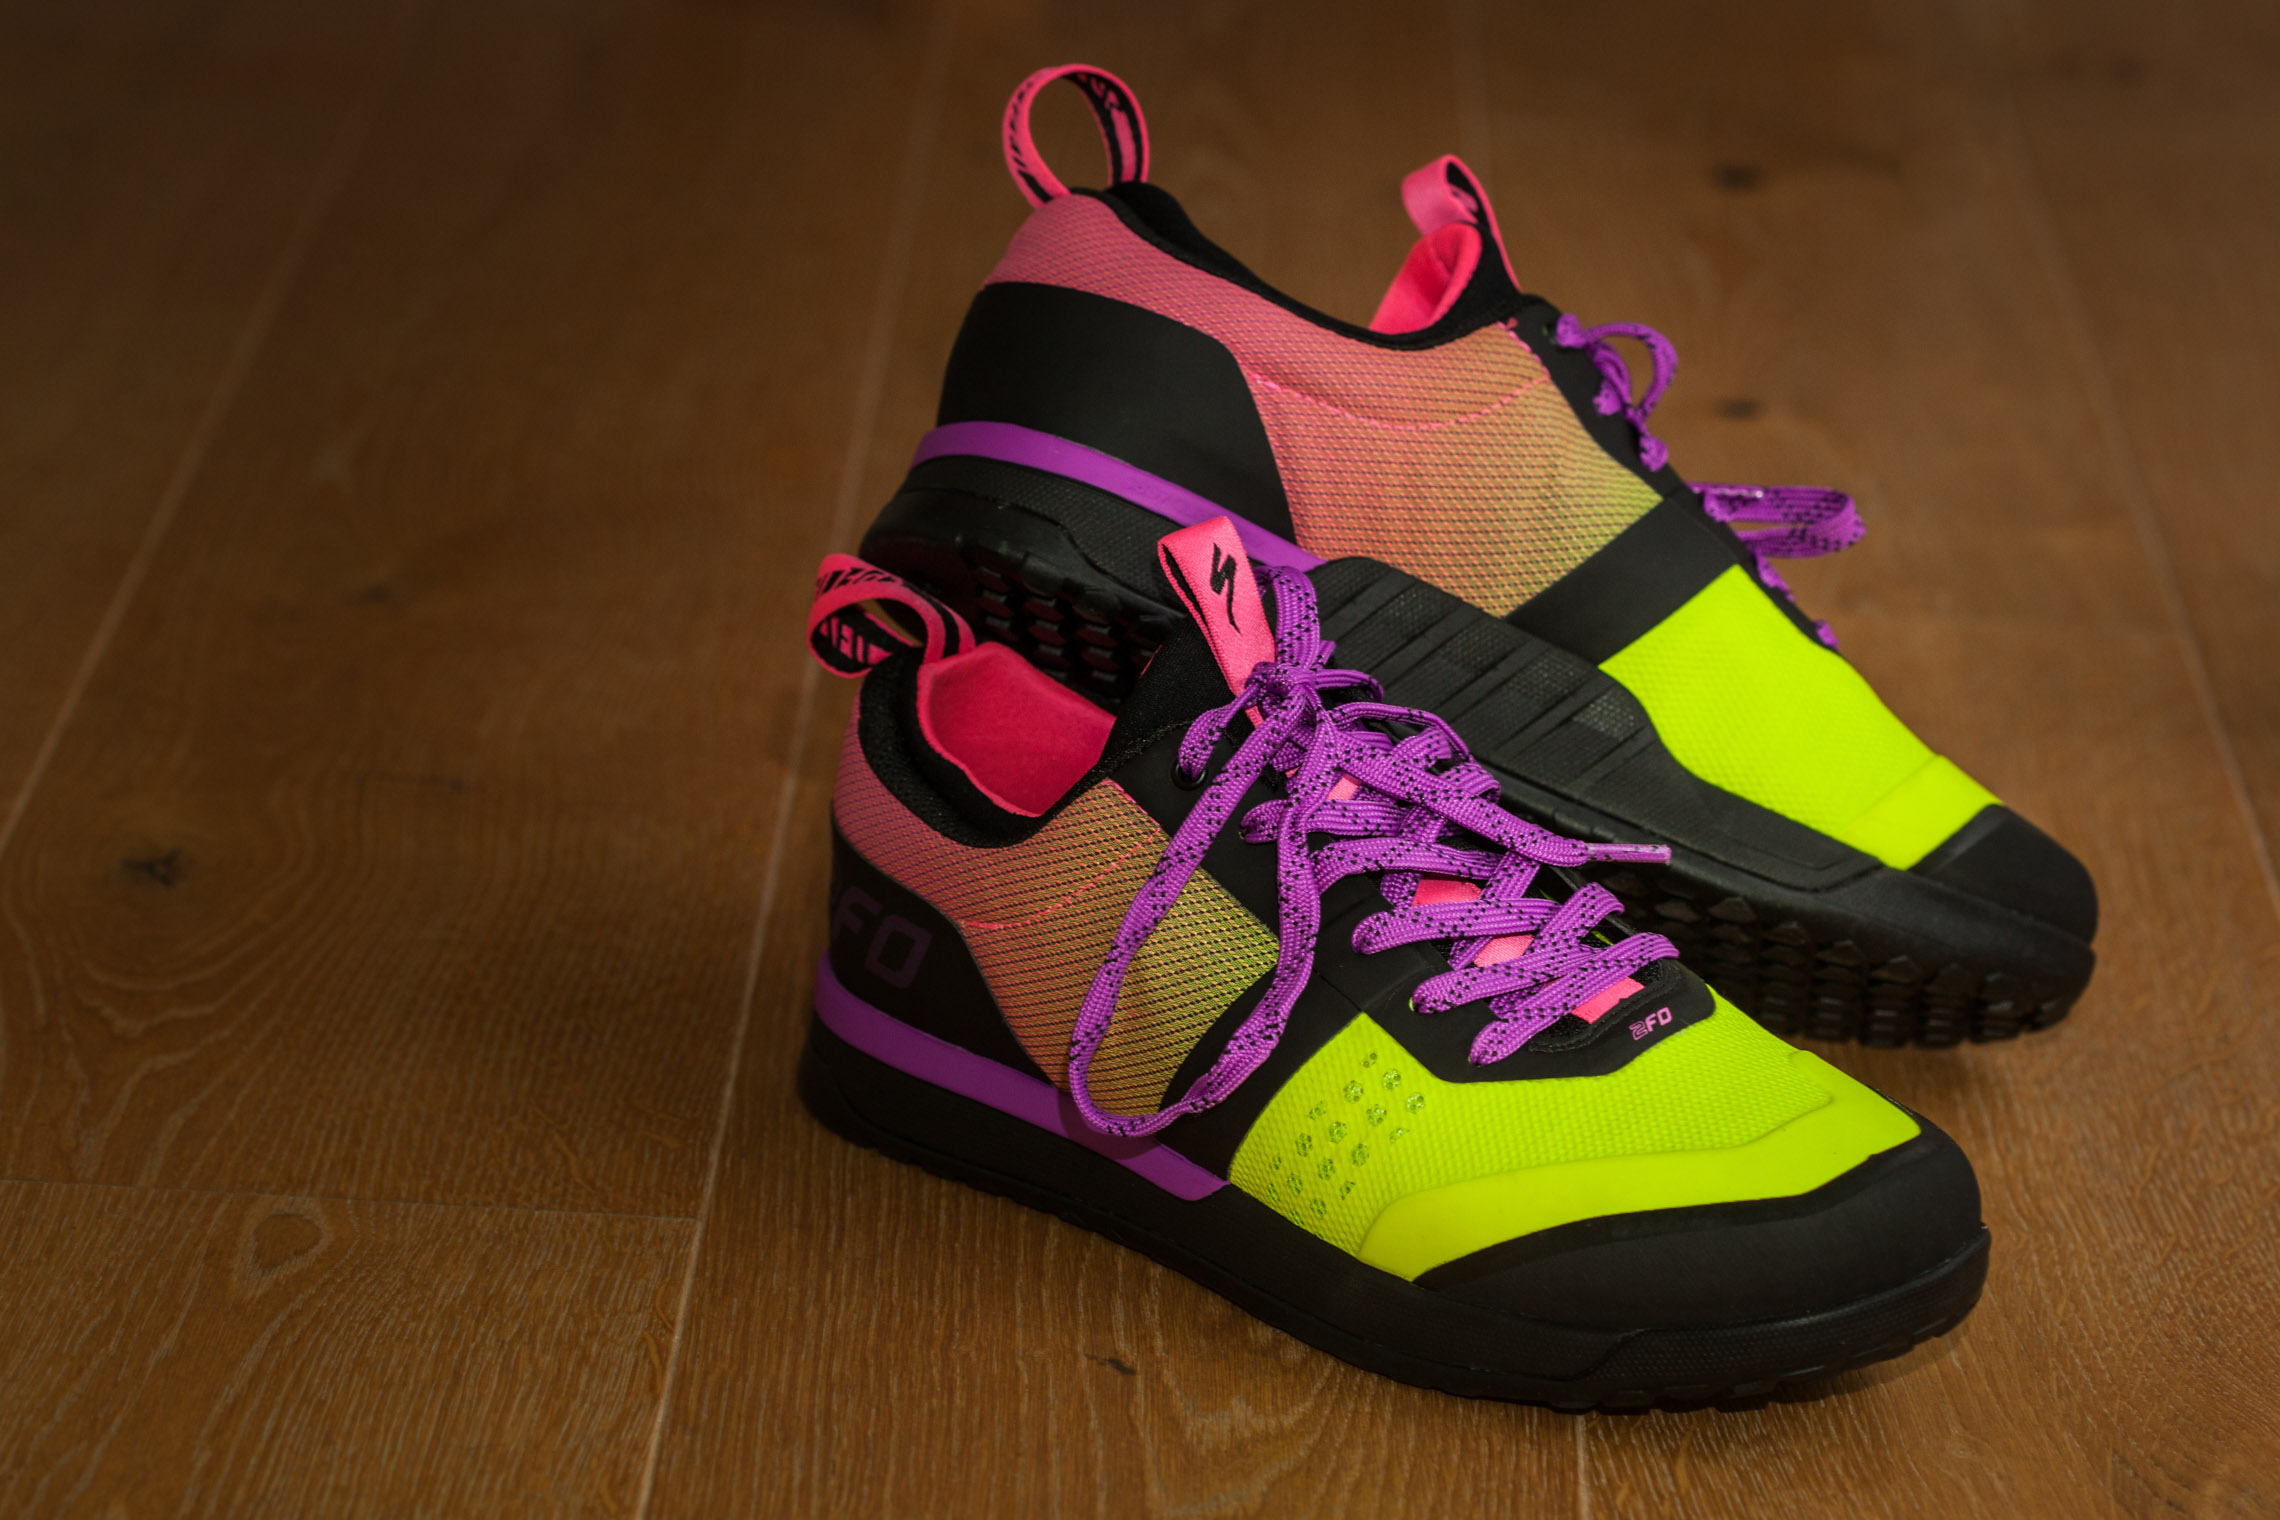 Specialized 2FO 1.0 Schuh im Test: Leuchtfarbenes